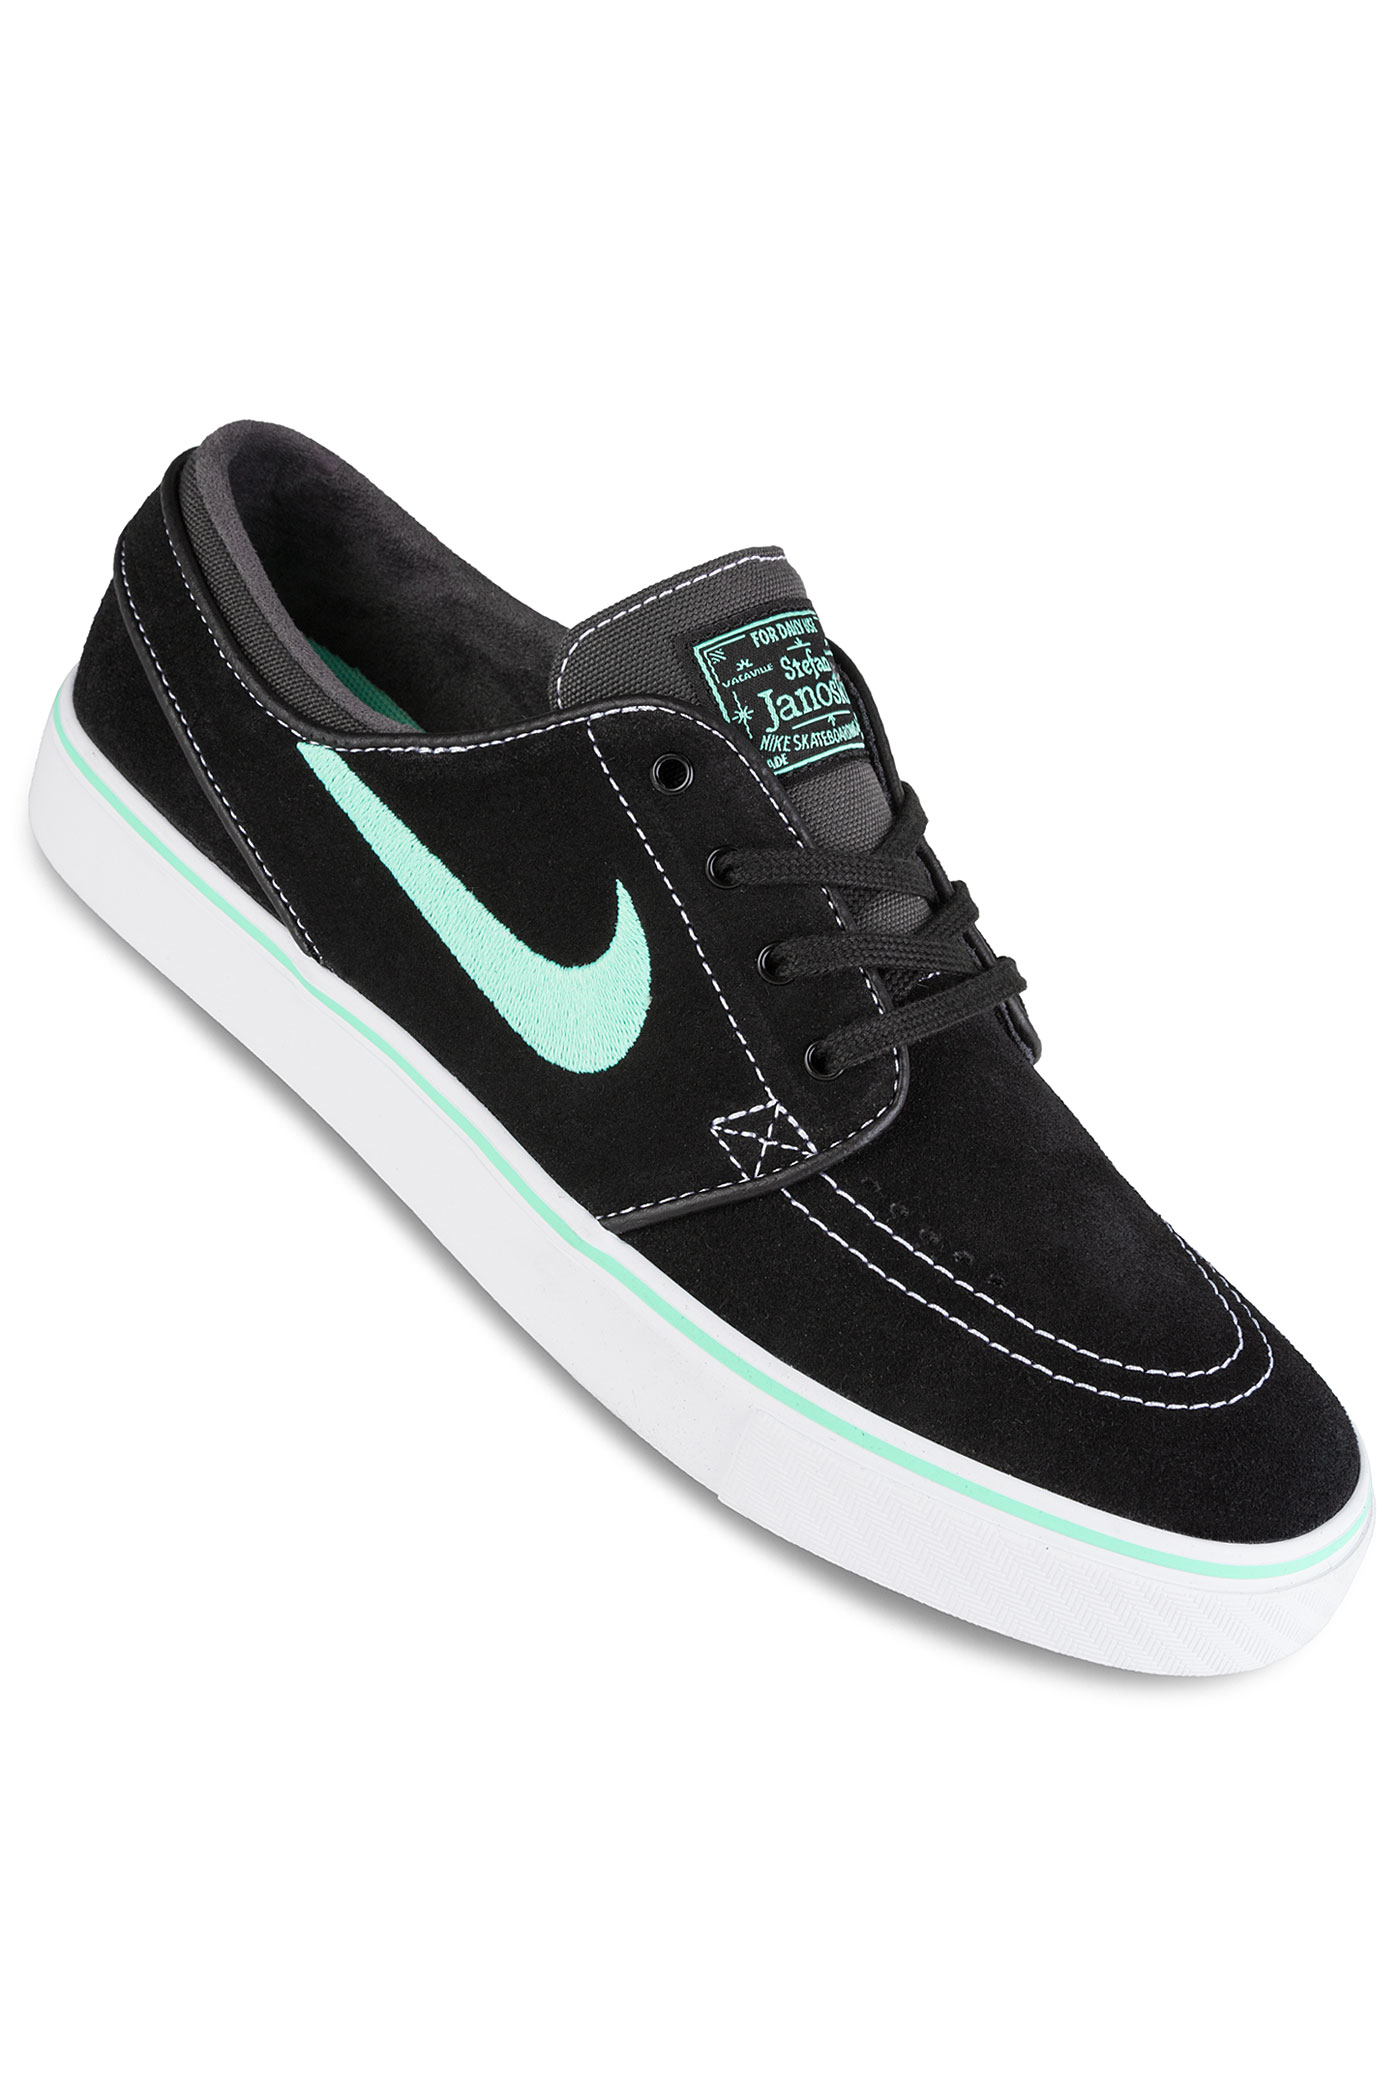 nike sb zoom stefan janoski chaussure black green glow achetez sur skatedeluxe. Black Bedroom Furniture Sets. Home Design Ideas